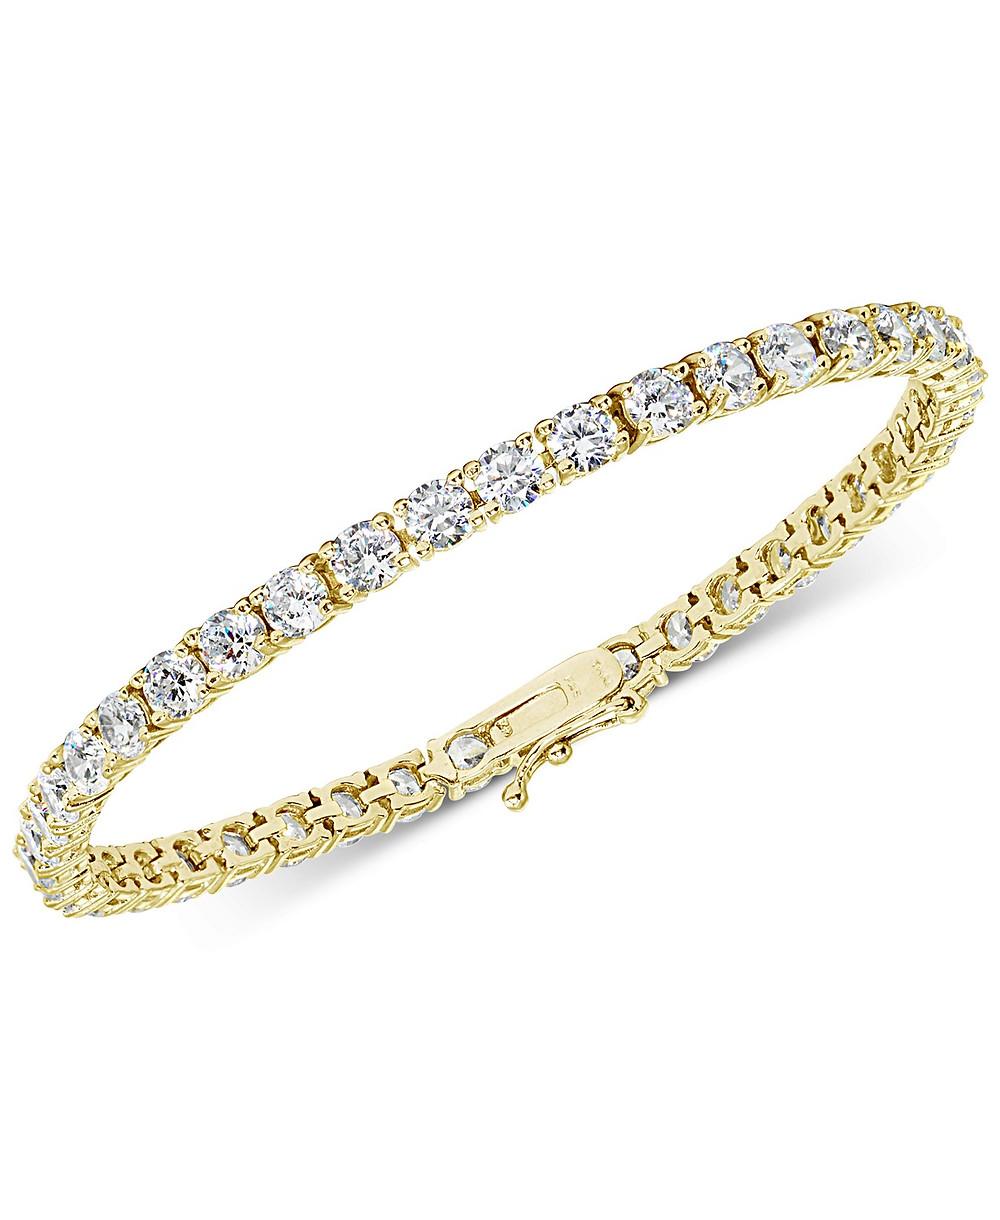 tennis bracelet, diamond tennis bracelet, bracelet, diamond bracelet, diamonds, cubic zirconia tennis bracelet, cubic zirconia bracelet, cubic zirconia